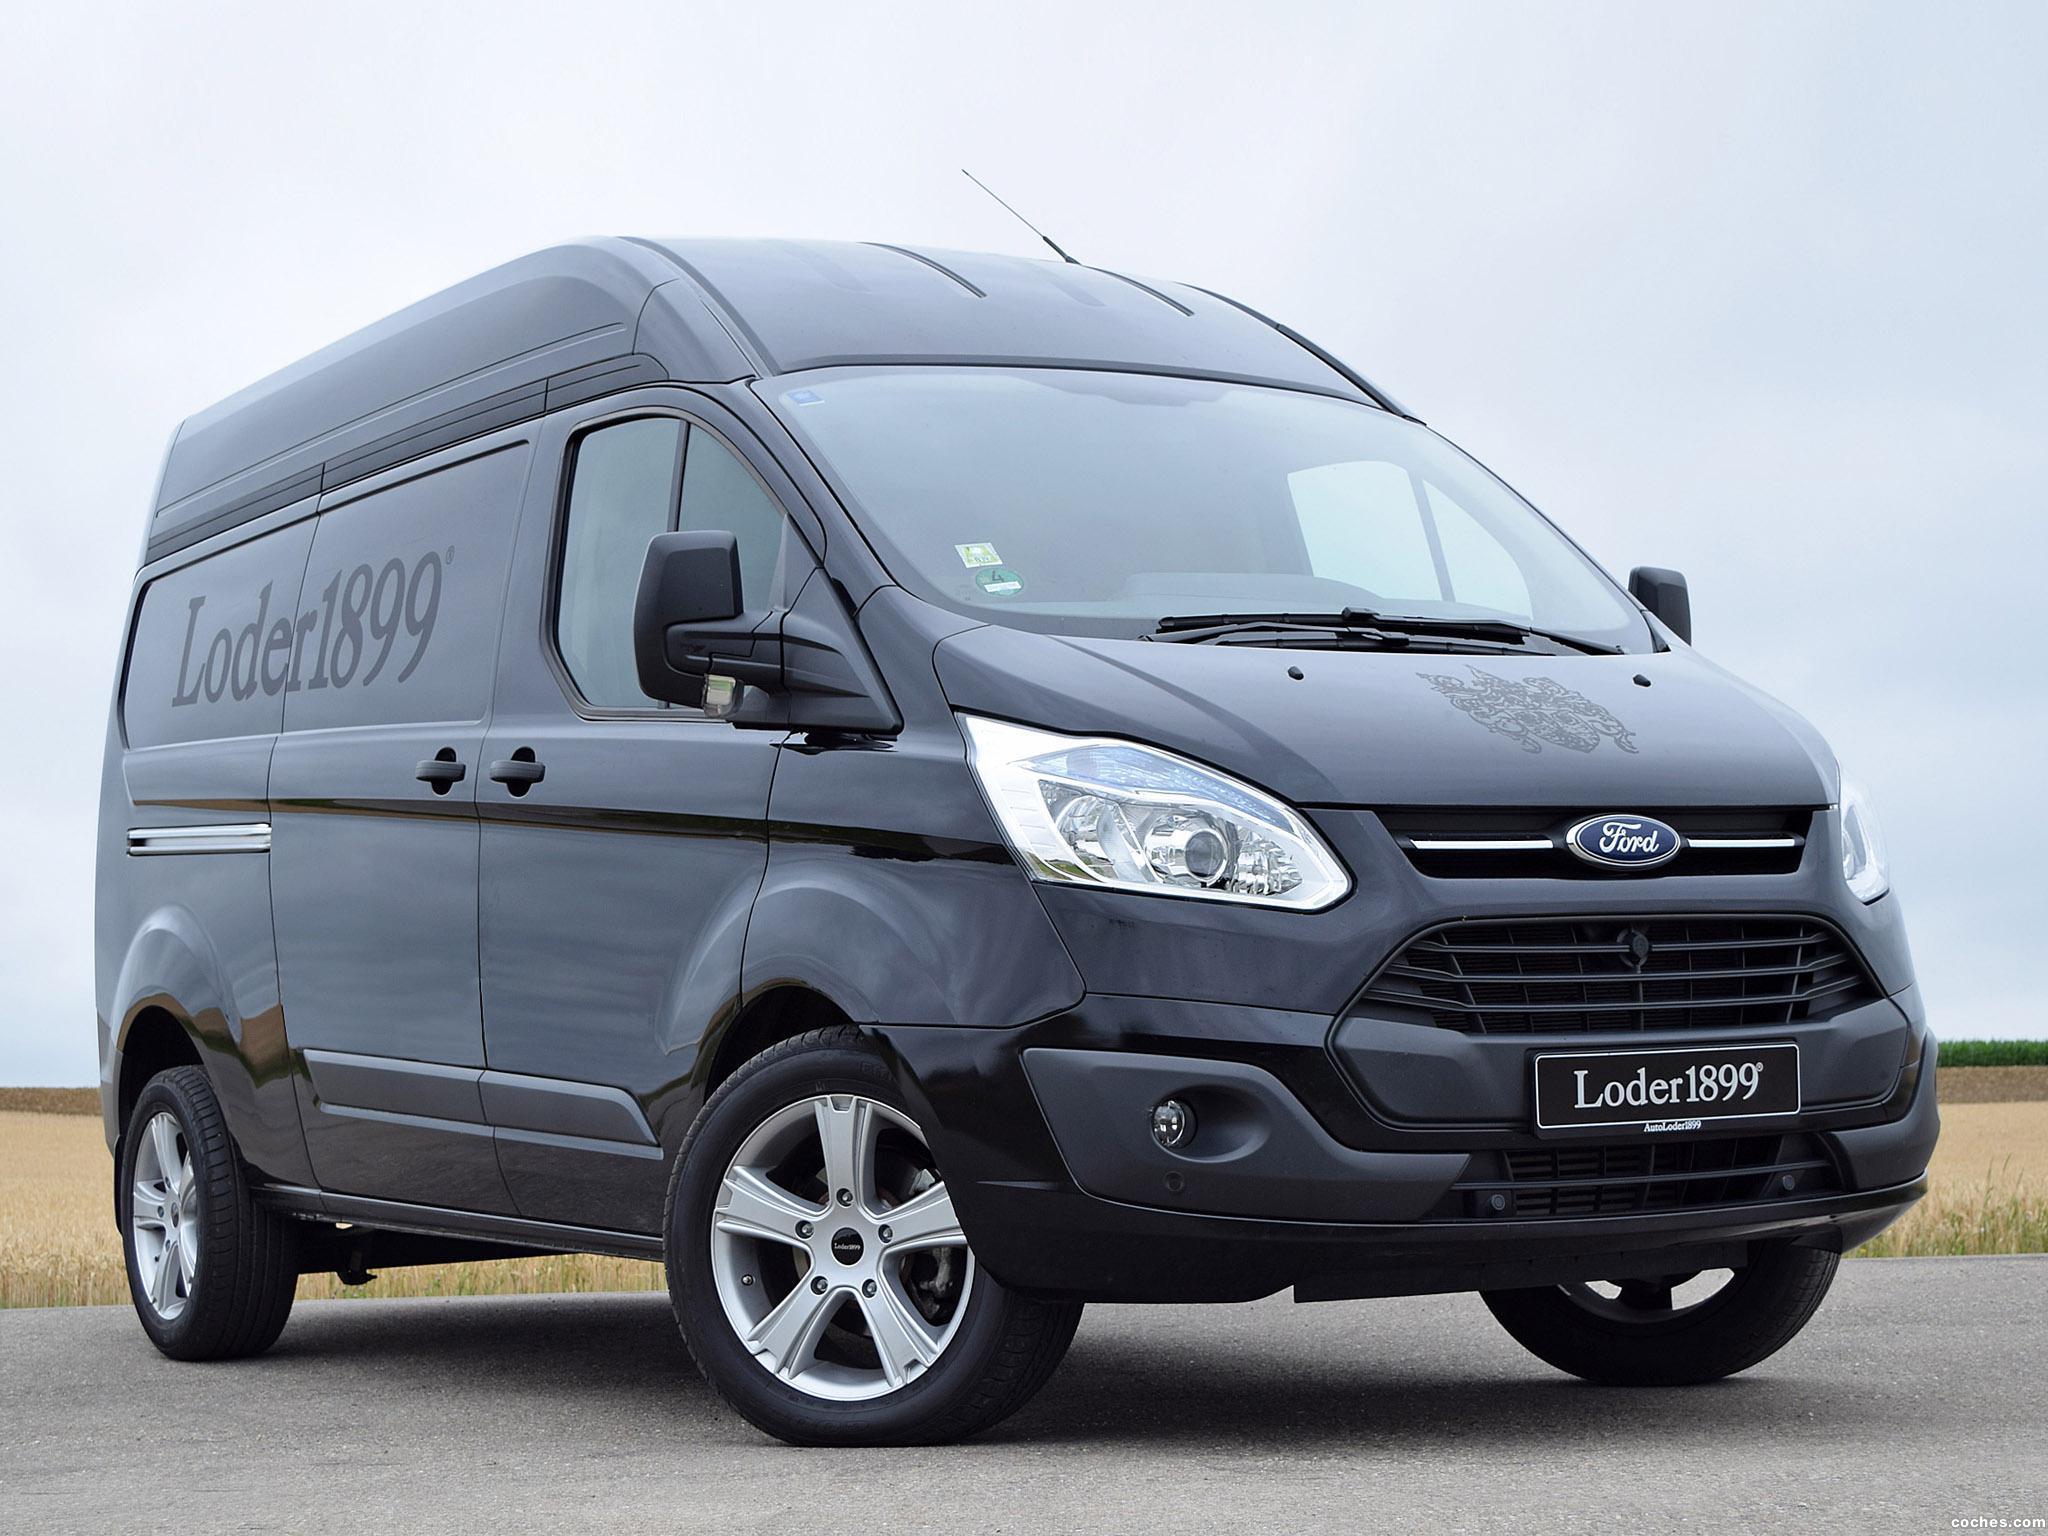 Foto 0 de Loder1899 Ford Transit Custom 2014